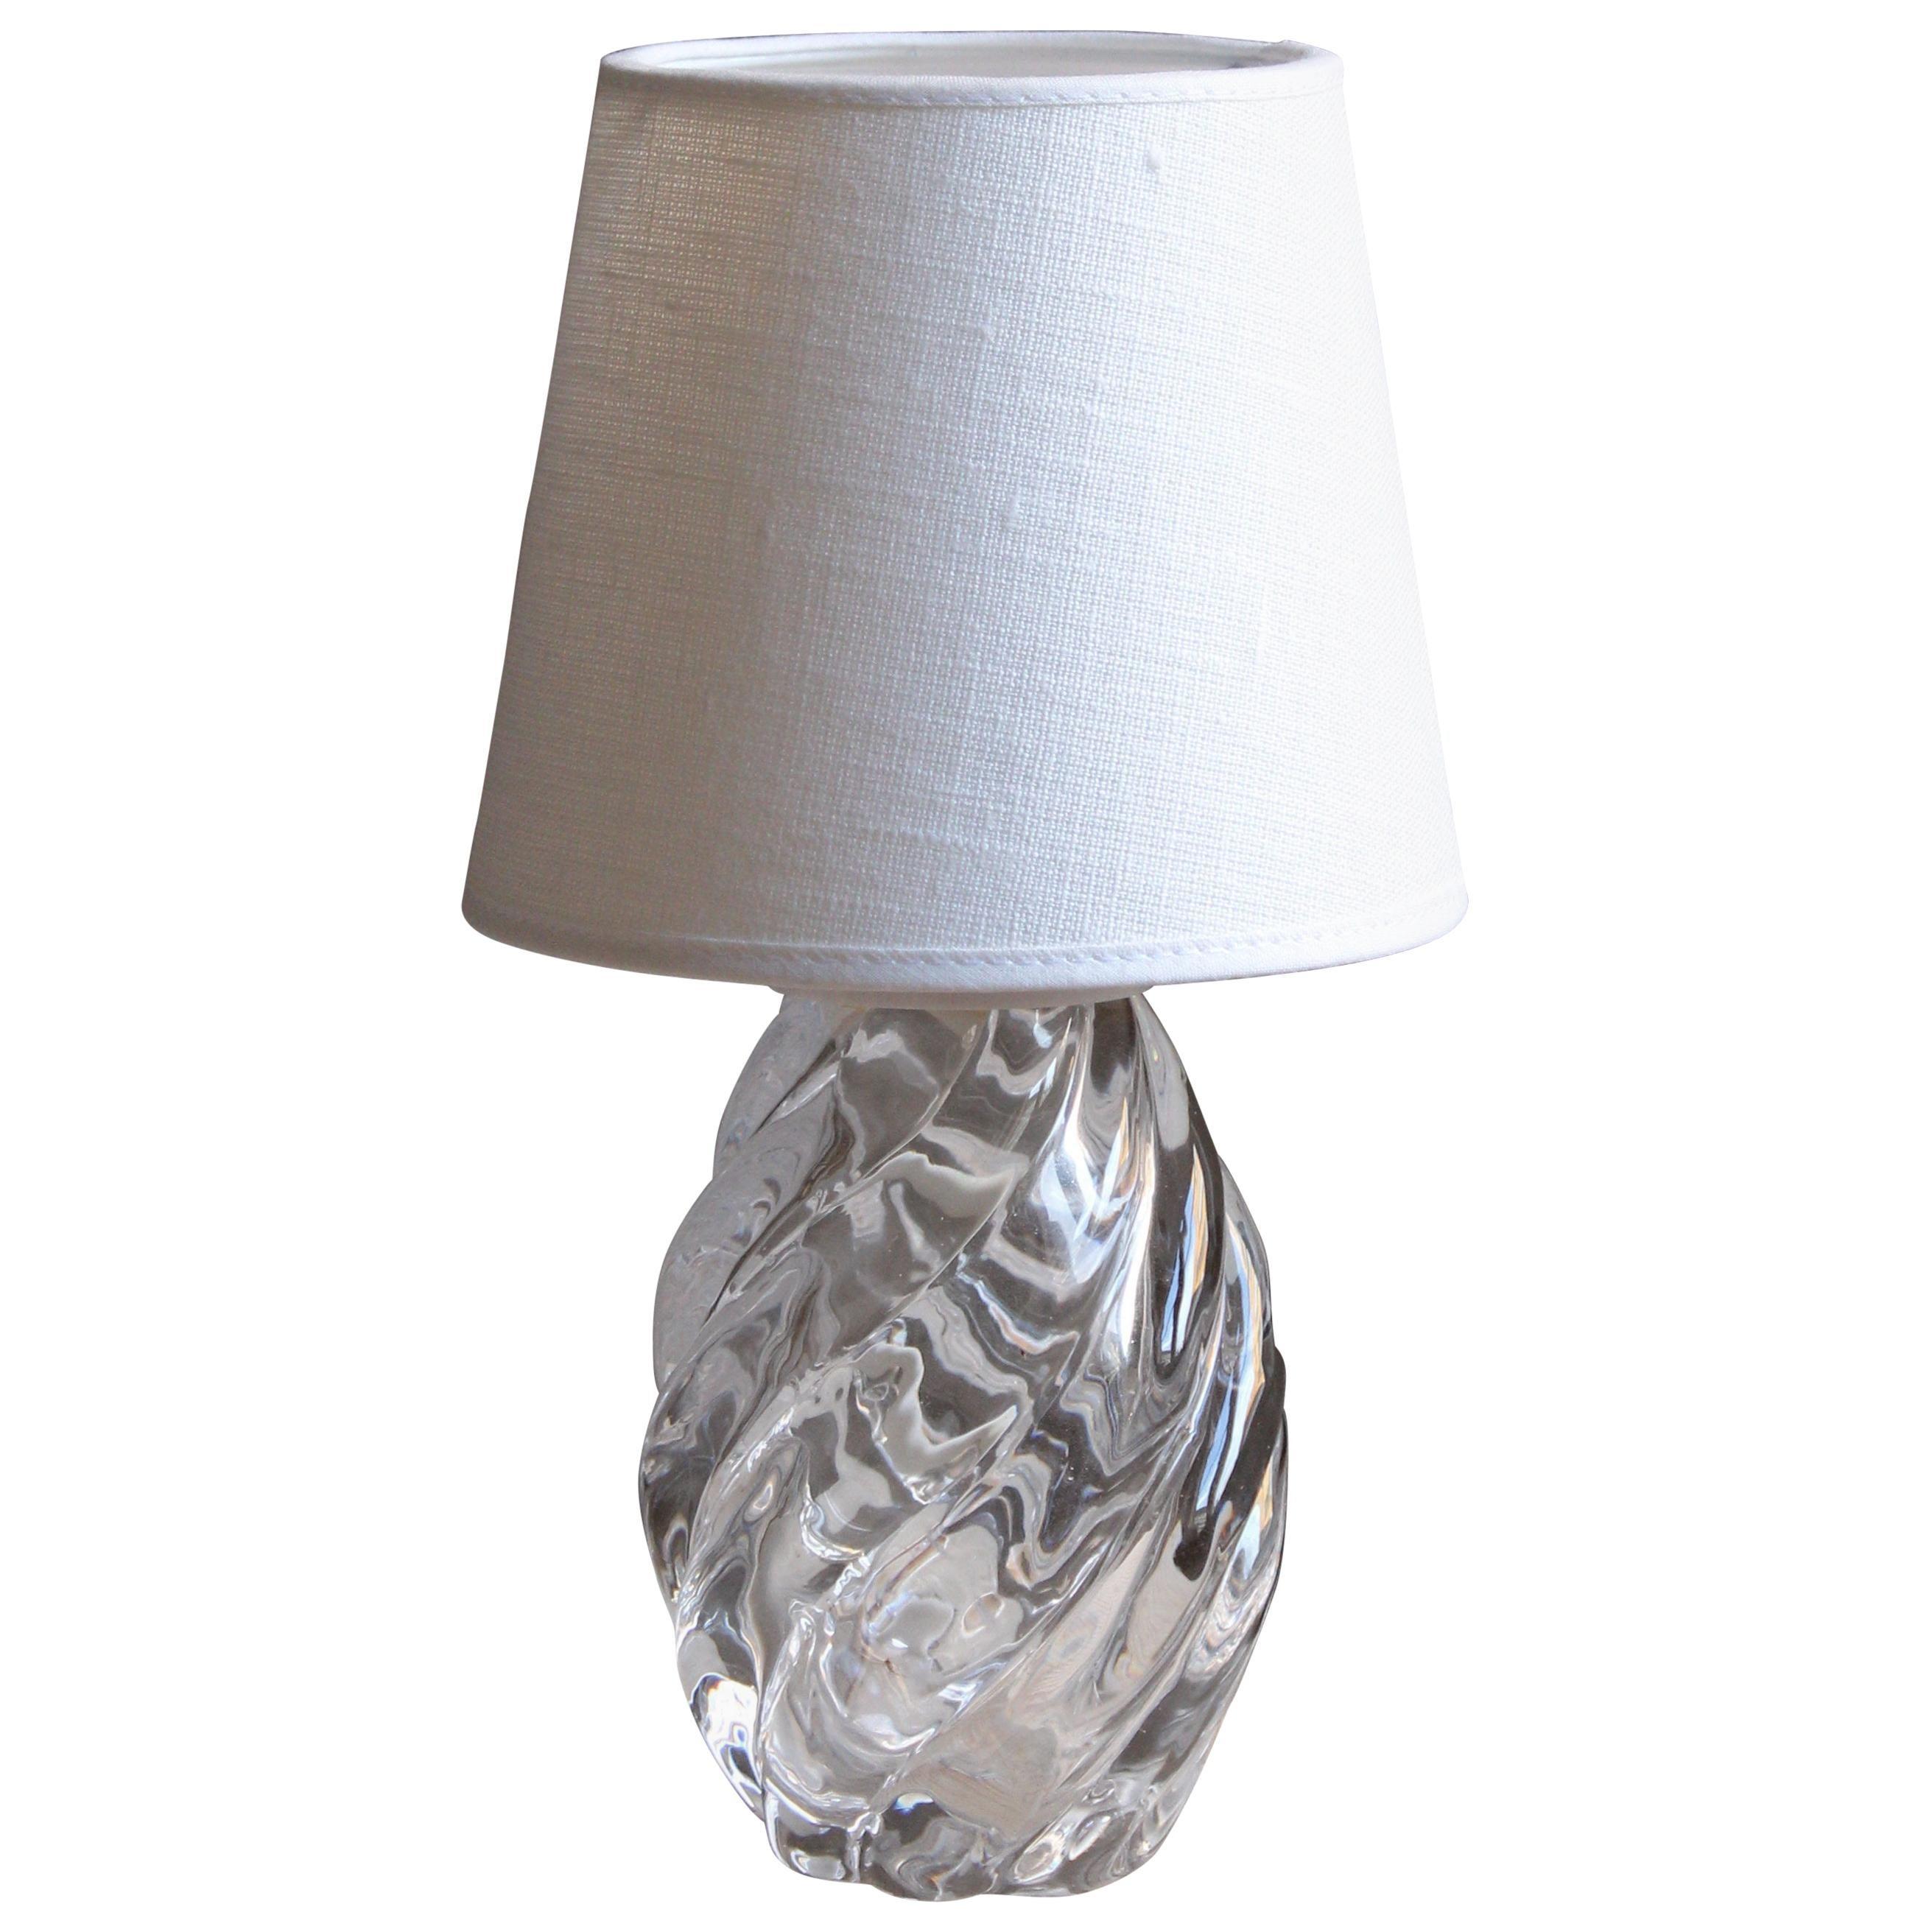 Reijmyre Glasbruk, Organic Table Lamp, Metal, Glass, Fabric, Sweden, 1950s